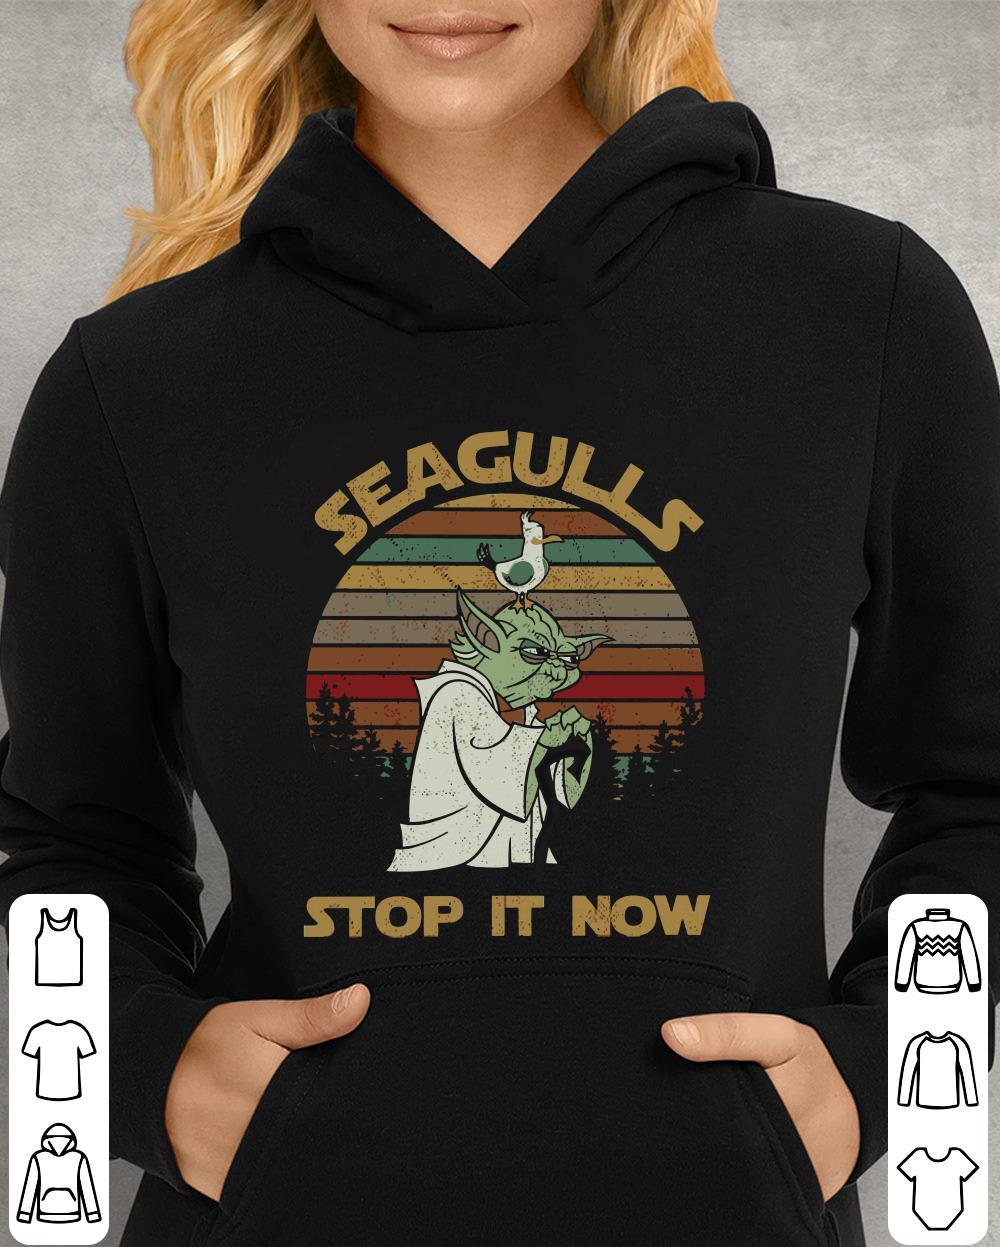 https://unicornshirts.net/images/2018/11/Sunset-retro-style-Seagulls-stop-it-now-shirt_4.jpg